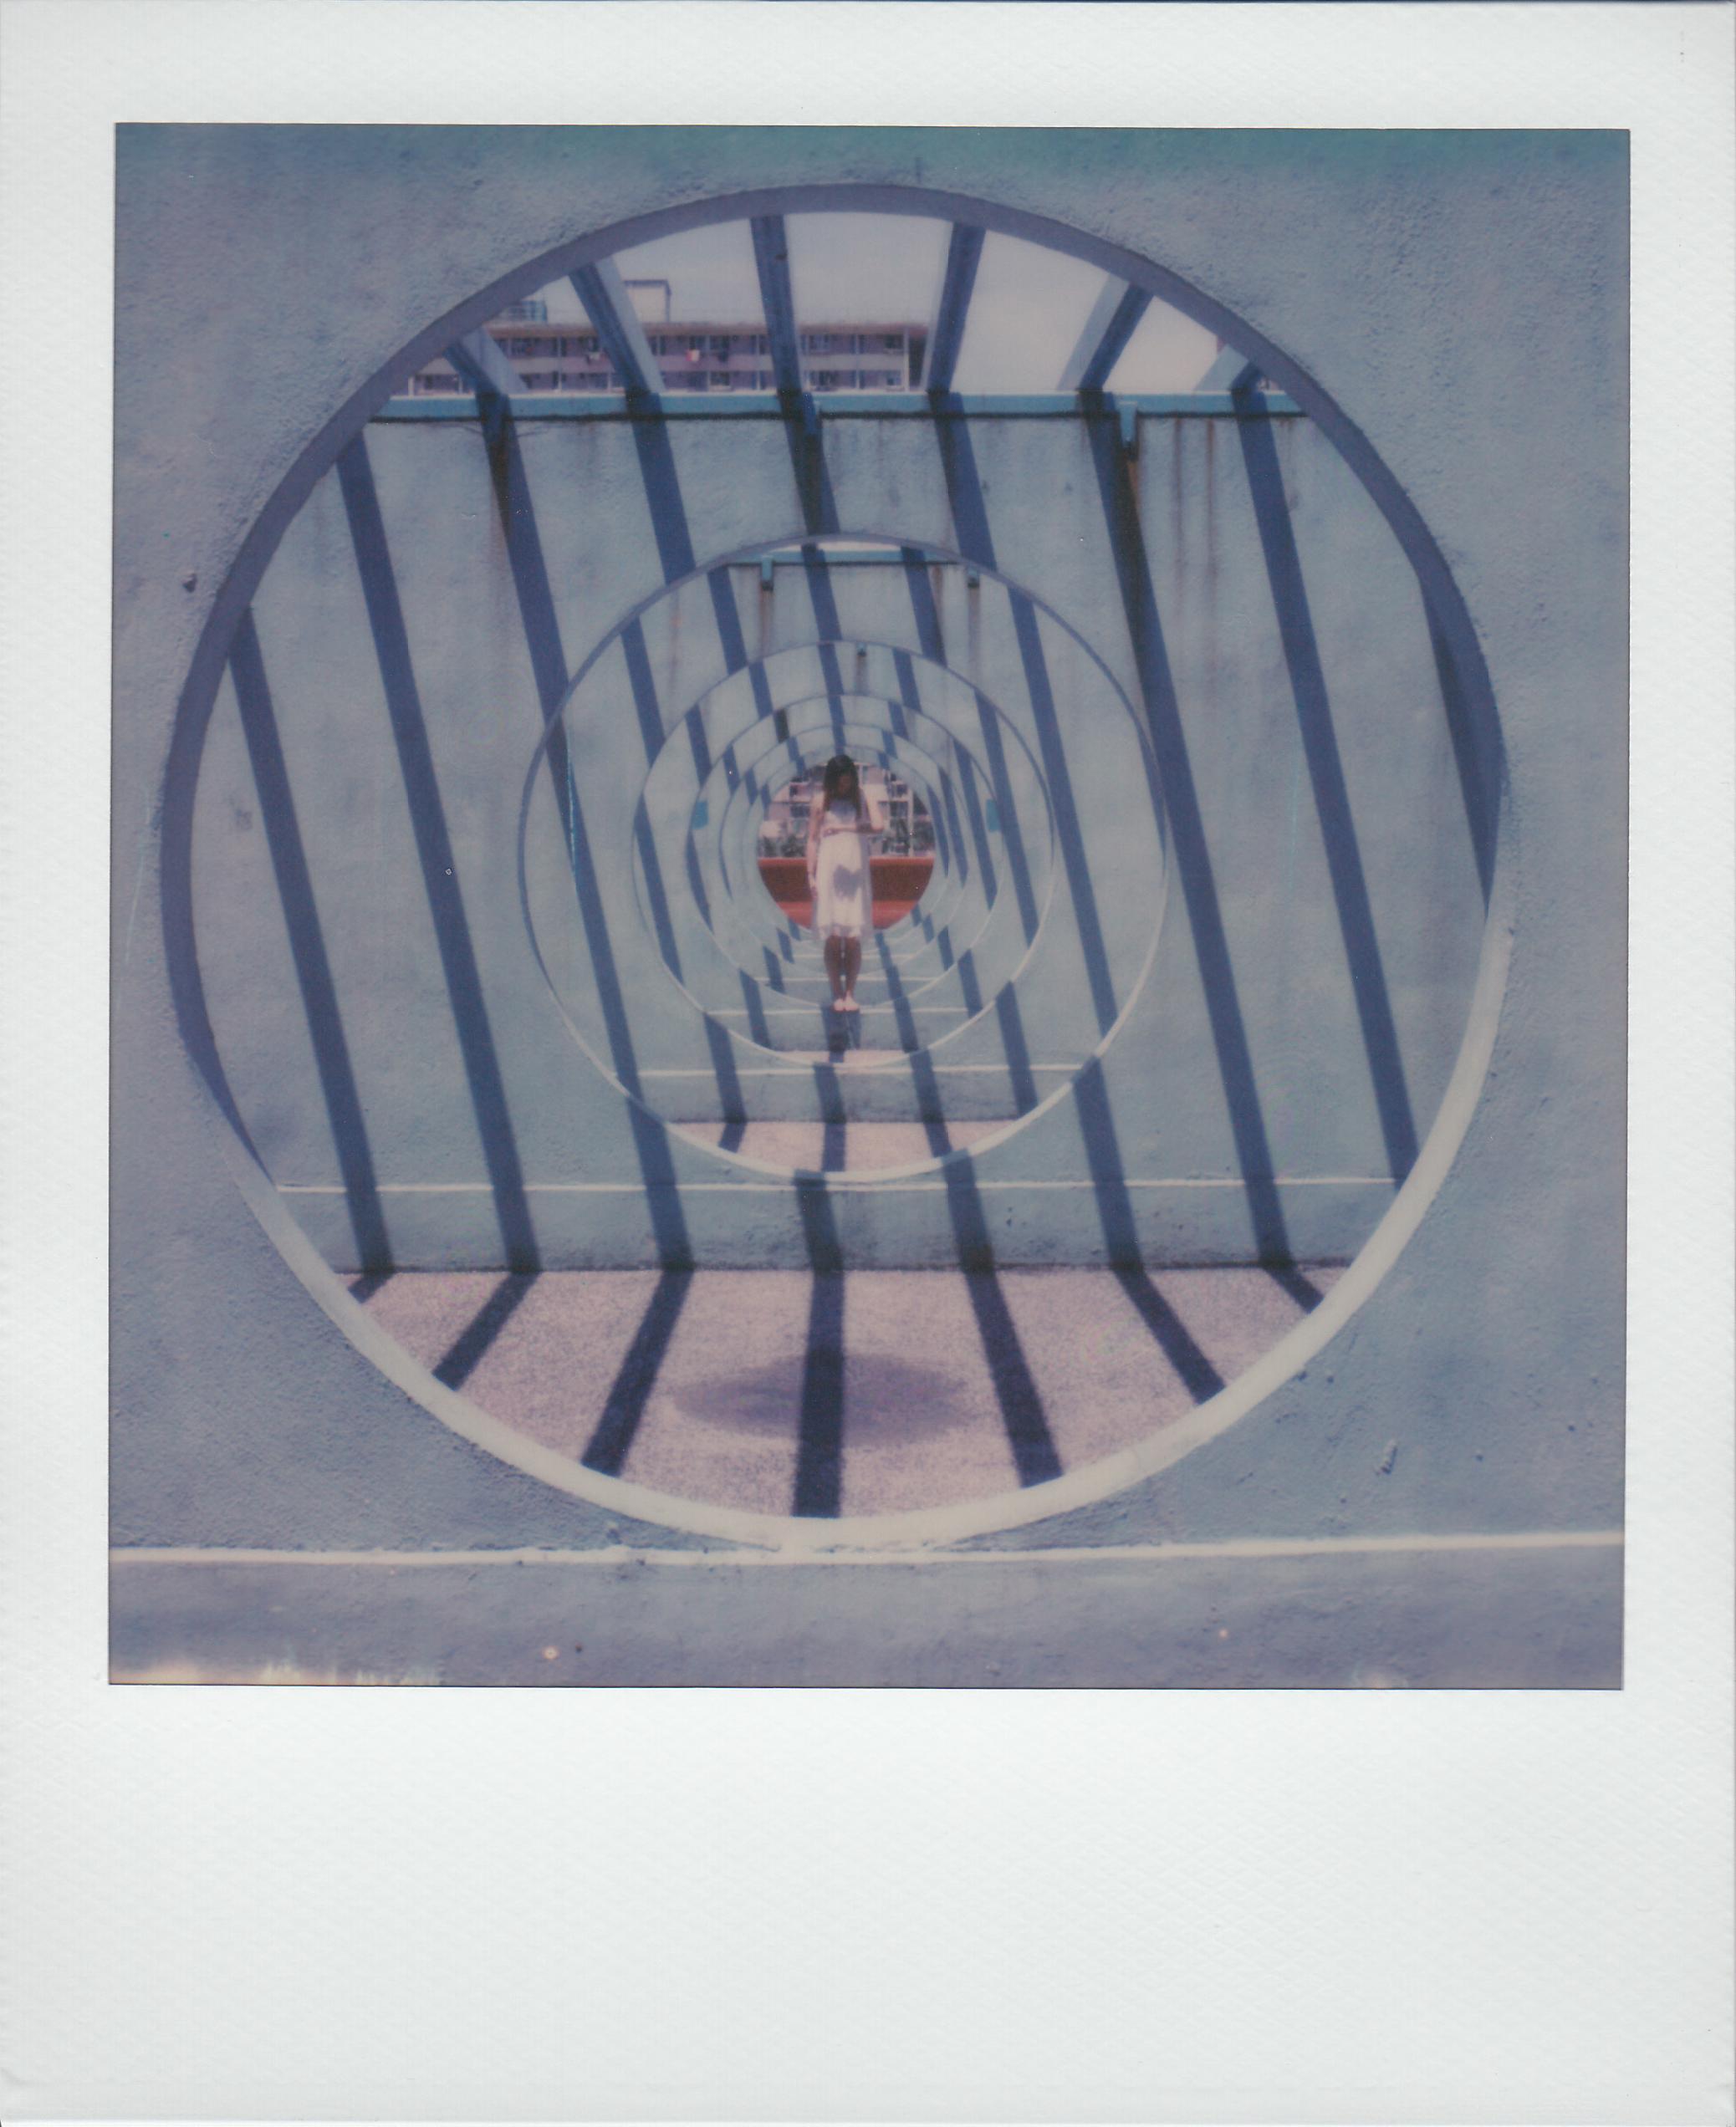 Time | MiNT SLR670S | Polaroid Originals 600 Color | Kin Ming Chan